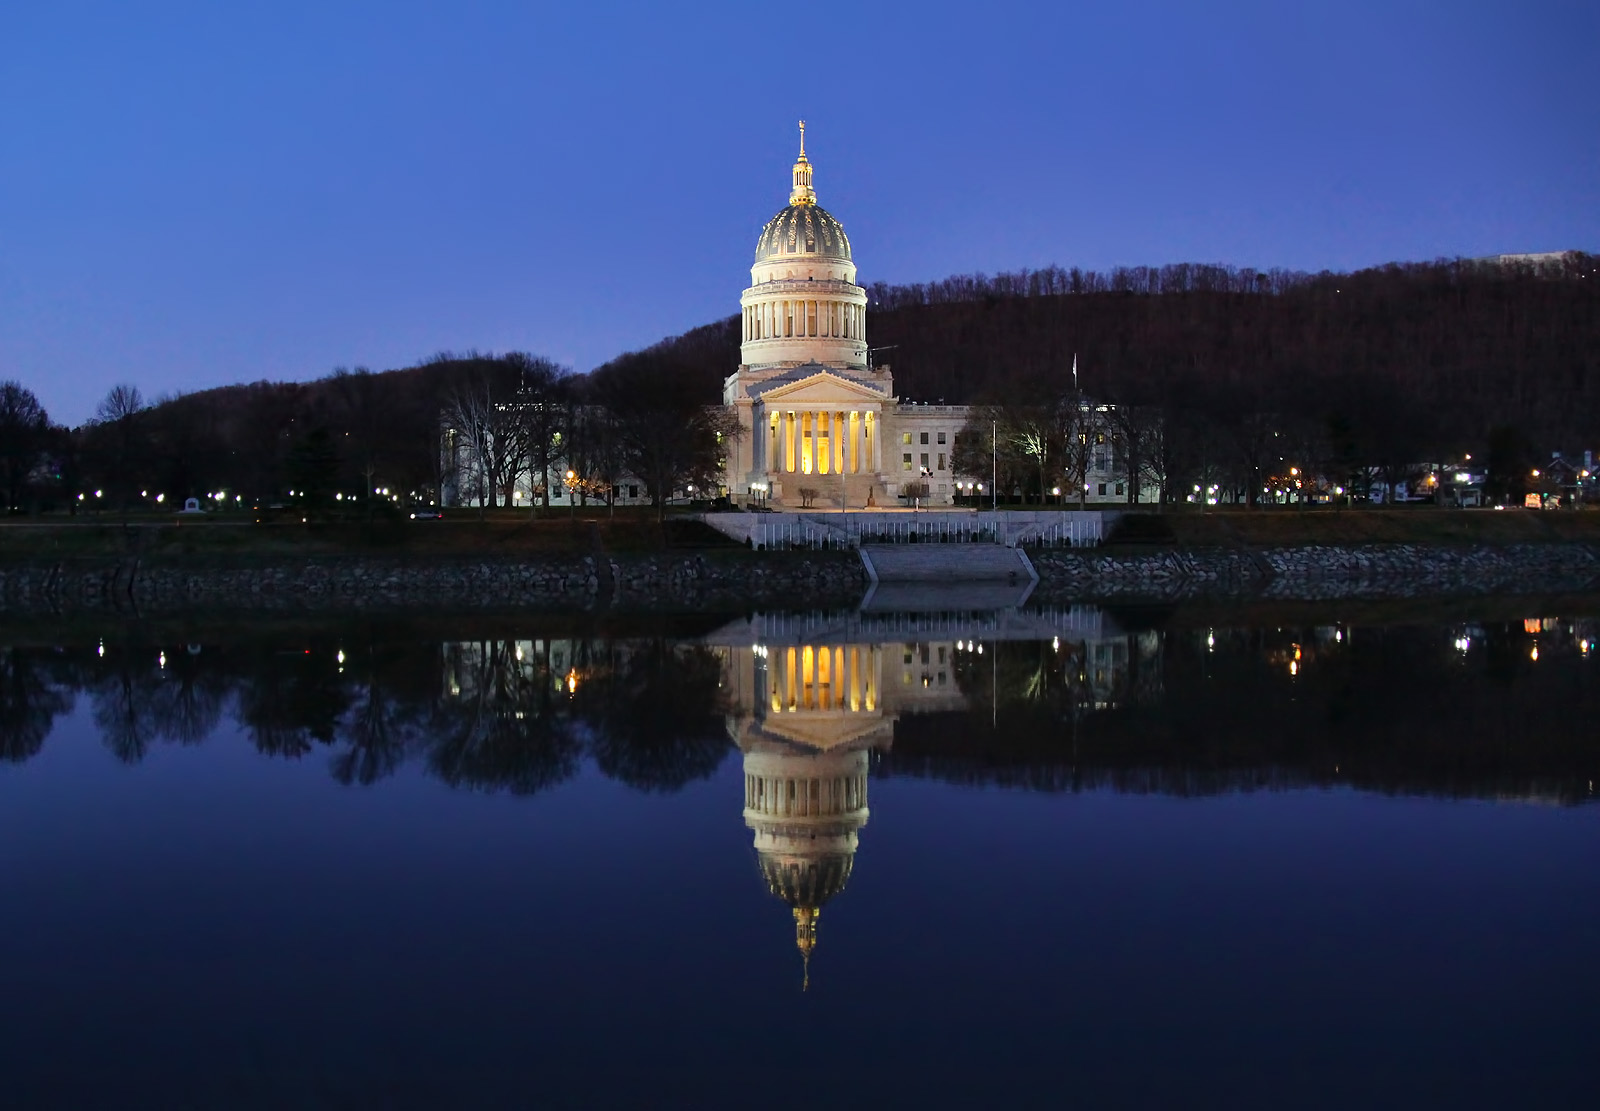 The_West_Virginia_State_Capitol_Building_in_Charleston,_WV.jpg